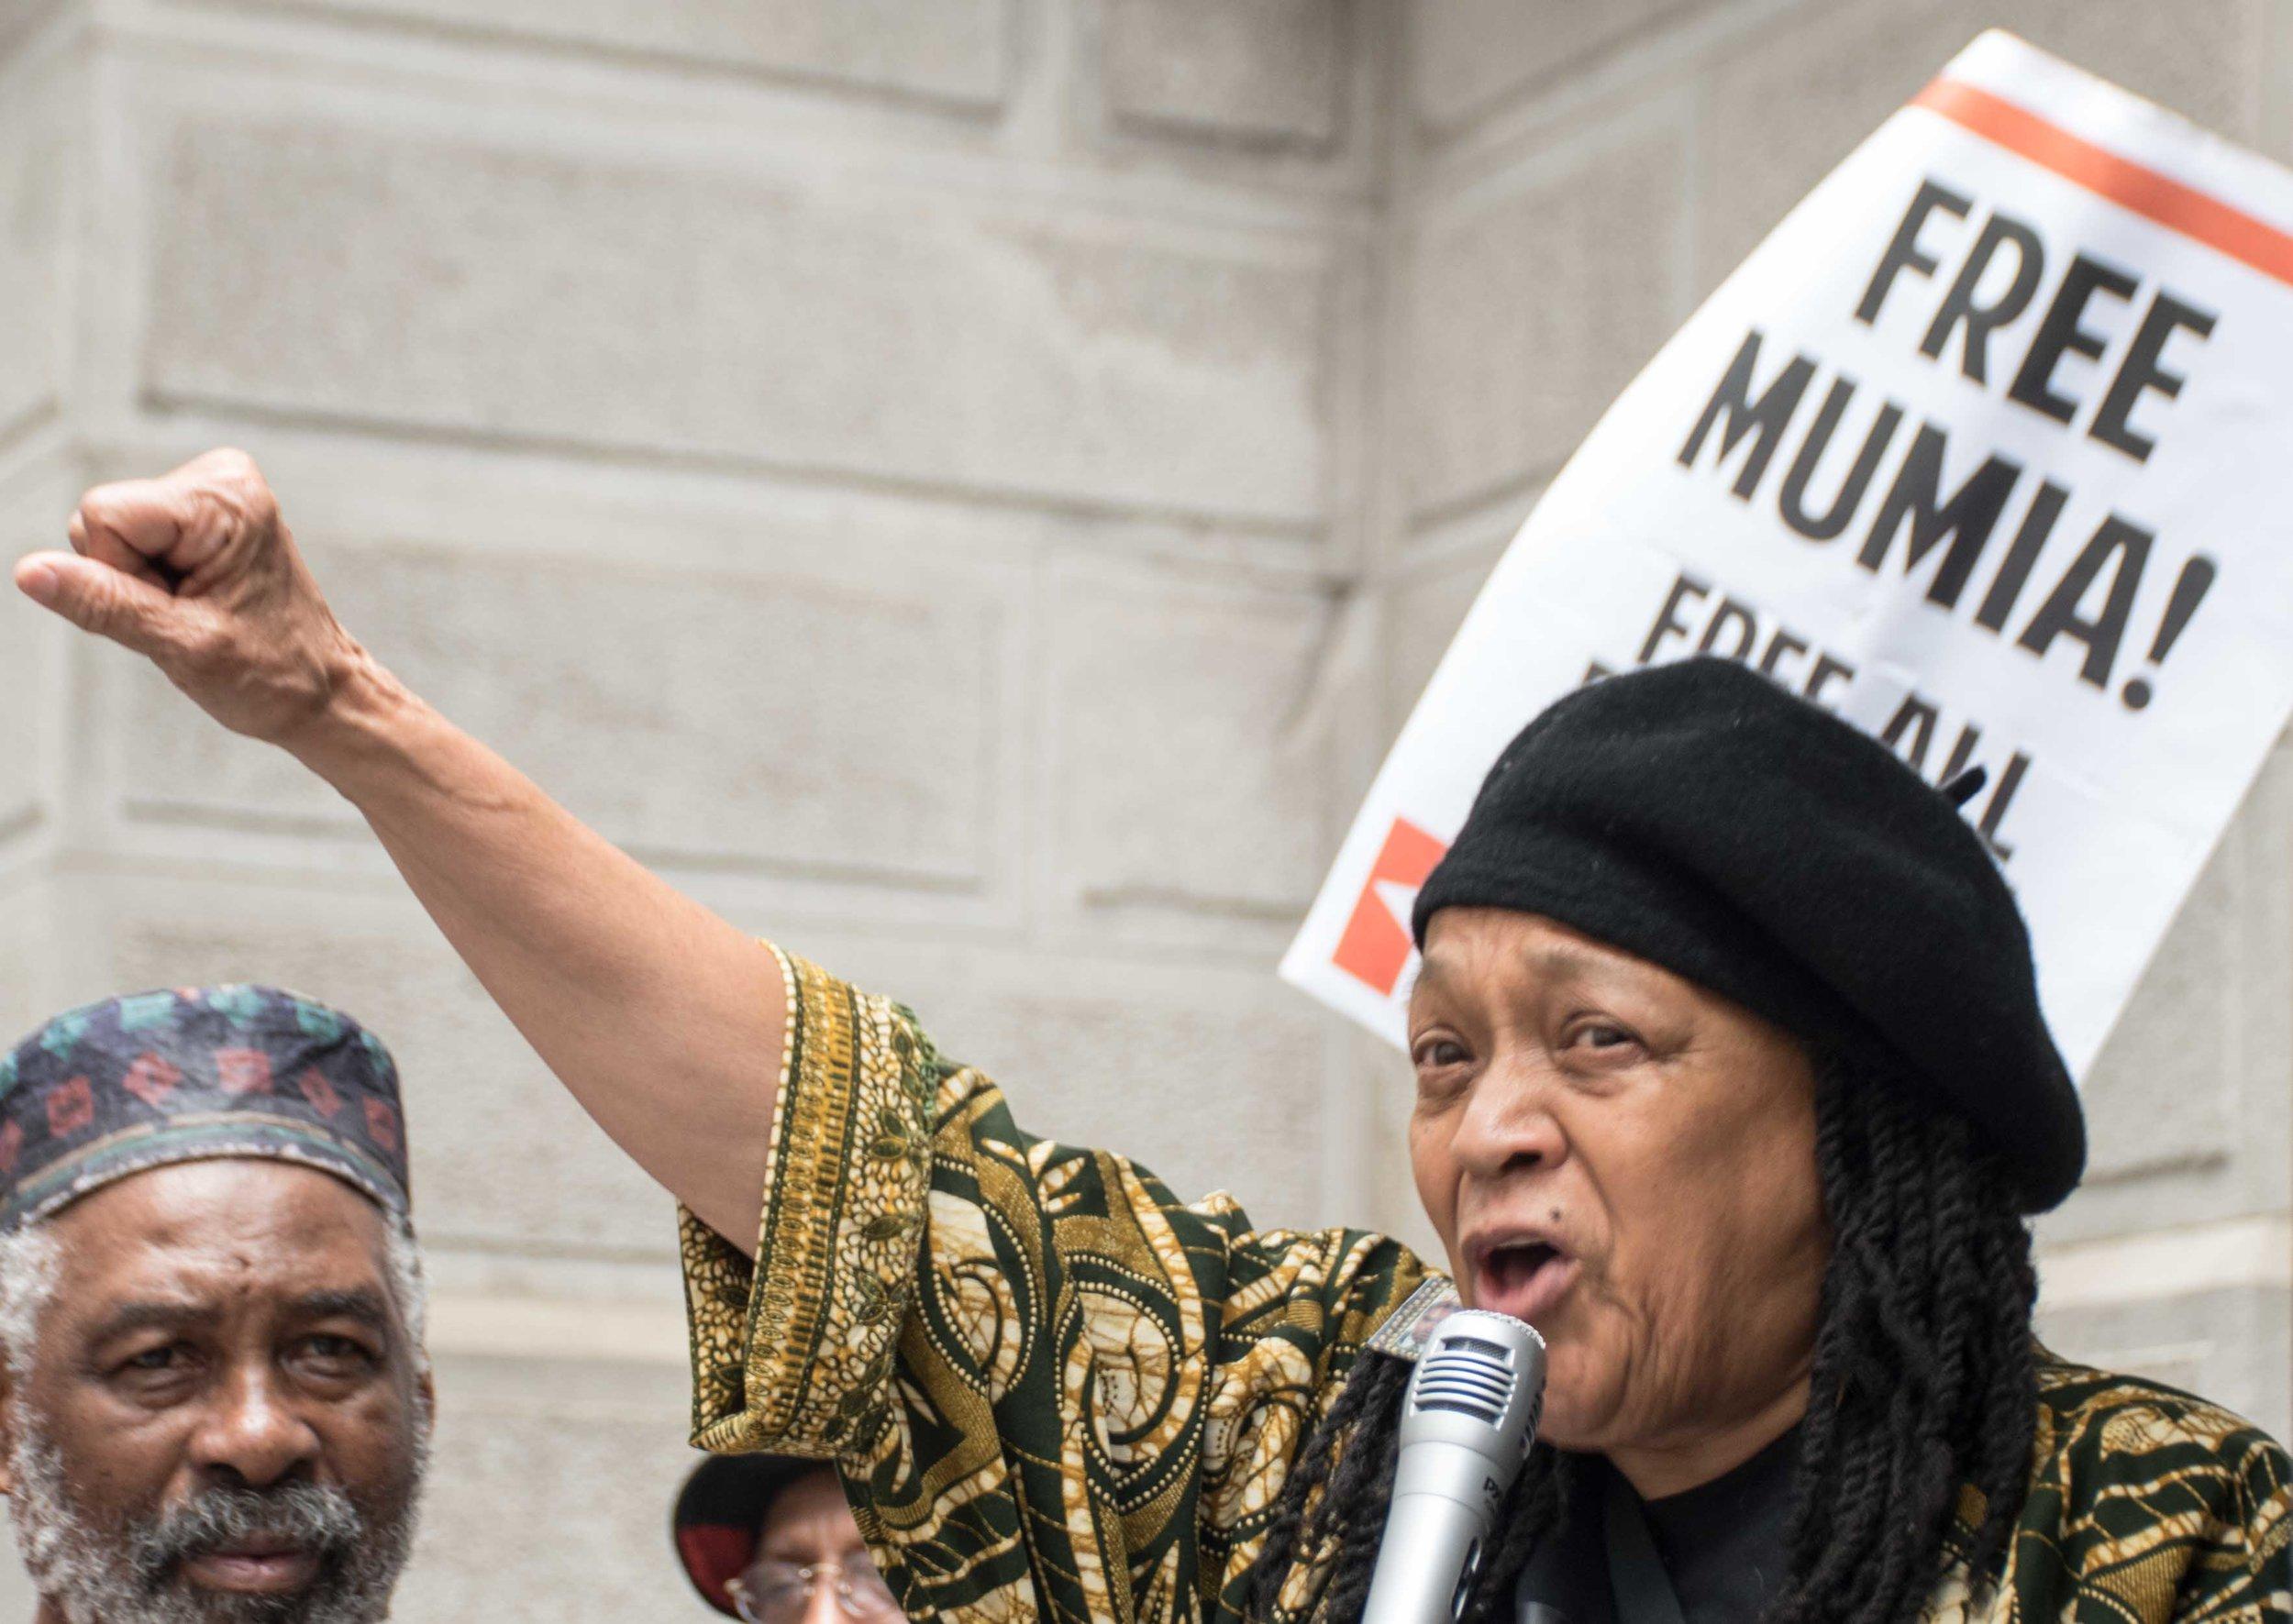 Philadelphia, Apr 18, 2019 - Press Conference for Mumia Abu-Jamal. Pam Africa (photo credit: Joe Piette)